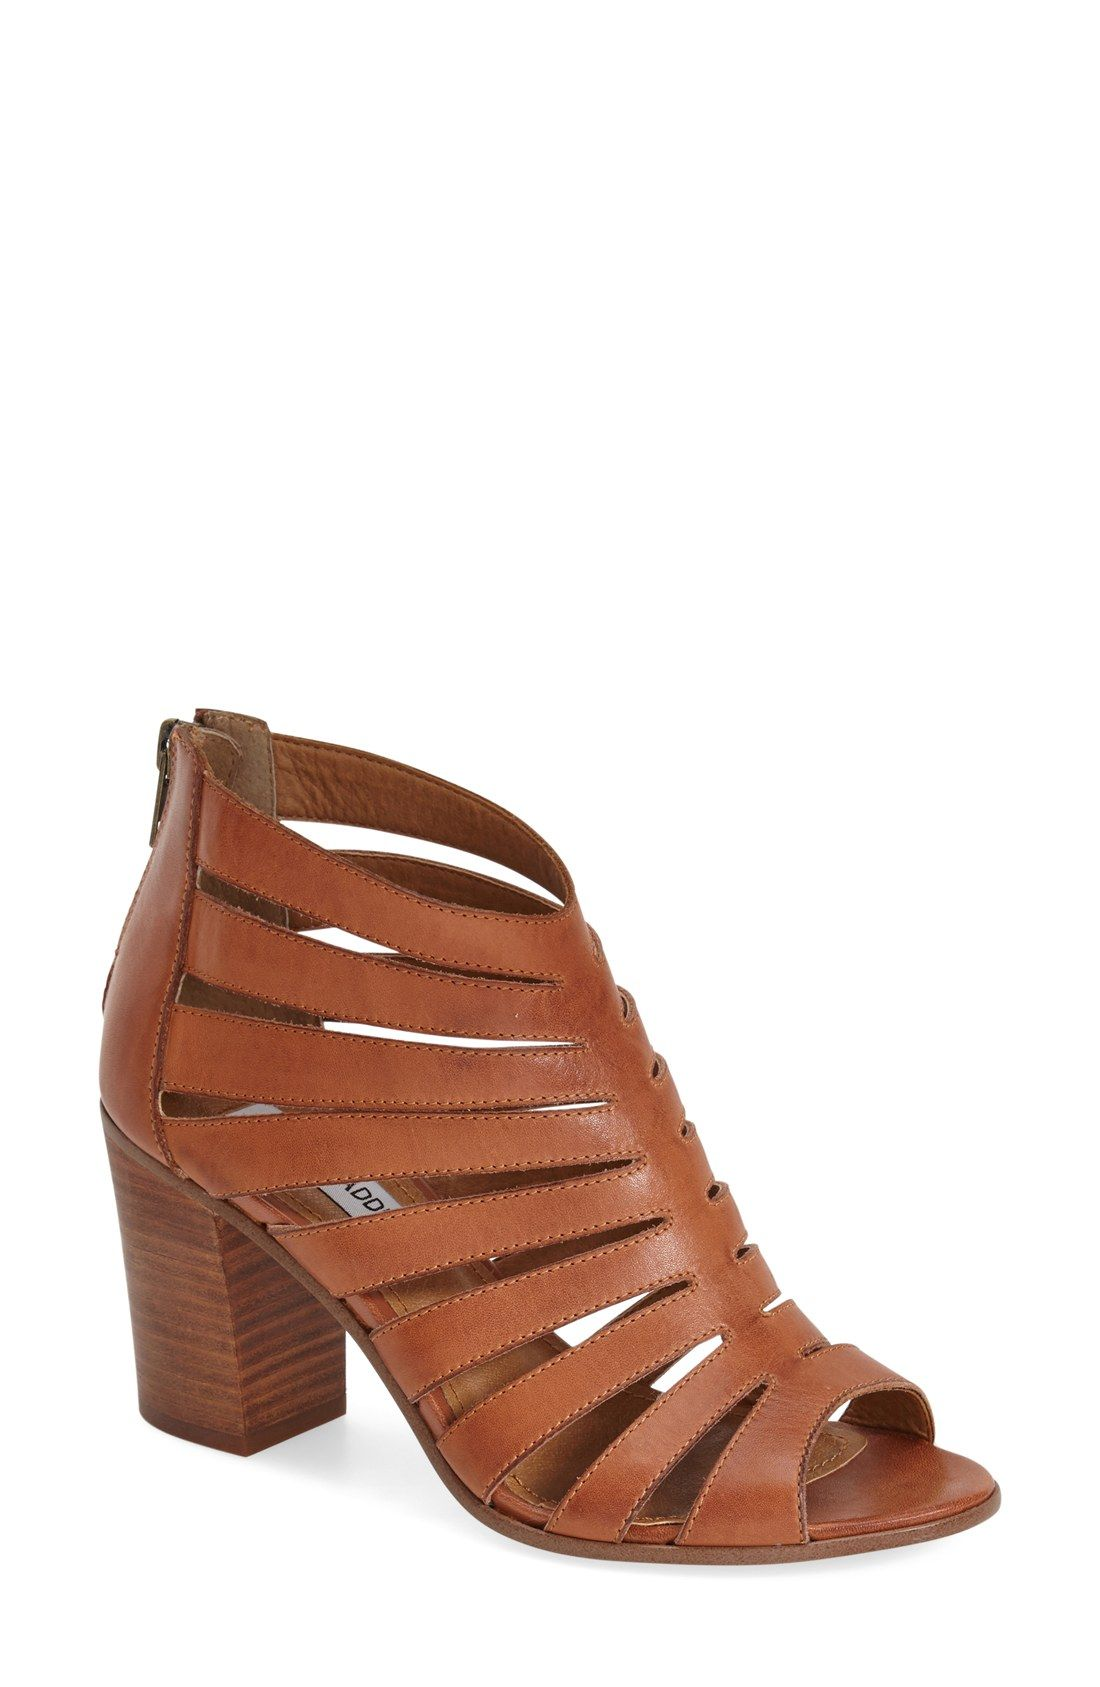 ed068bd3d51c Steve Madden 'Vendetaa' Cutout Bootie (Women) | shoes | Shoes ...